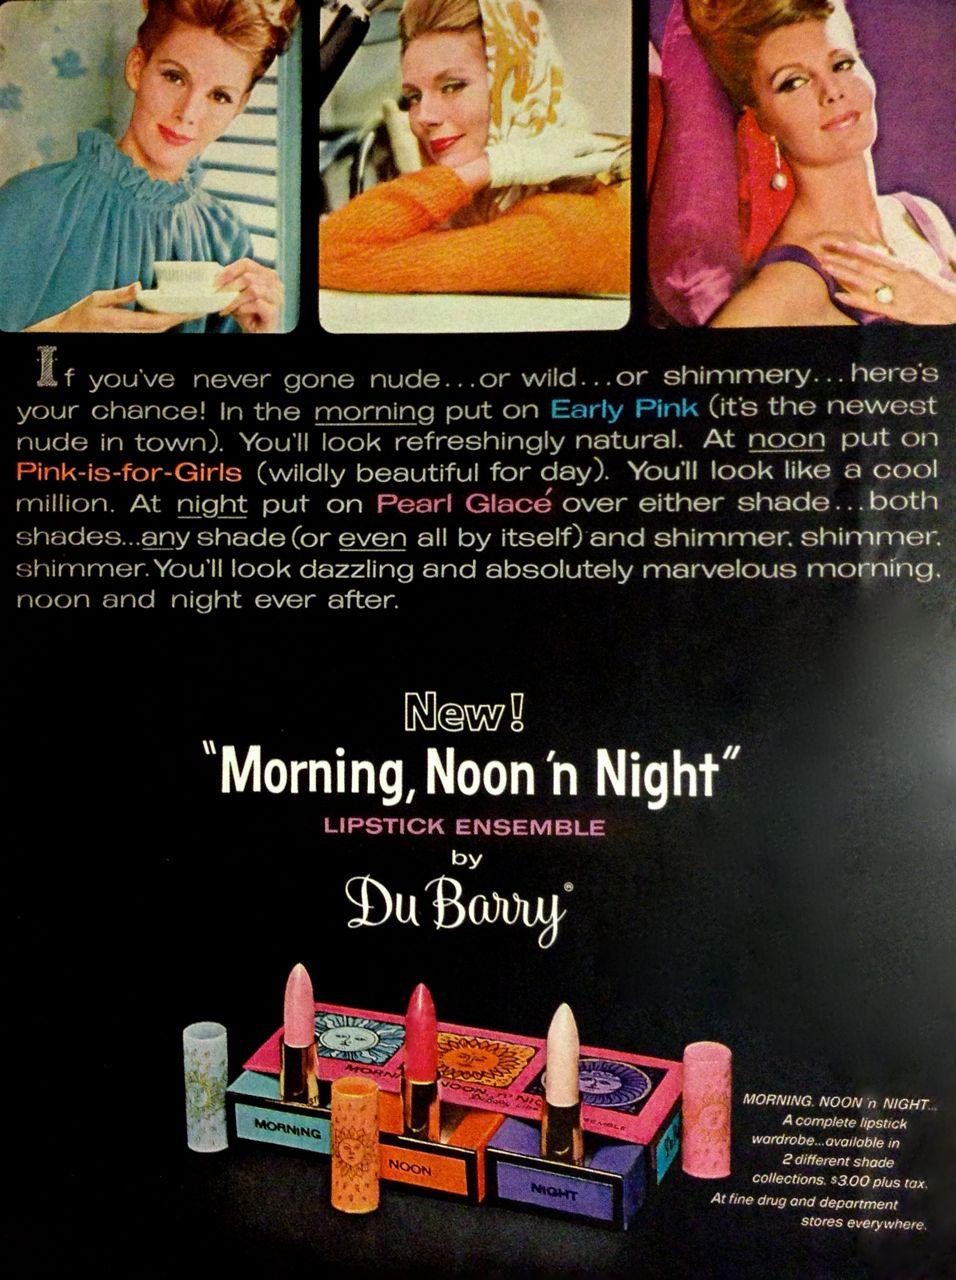 Du Barry 'Morning, Noon 'n Night' Lipstick Ensemble Ad